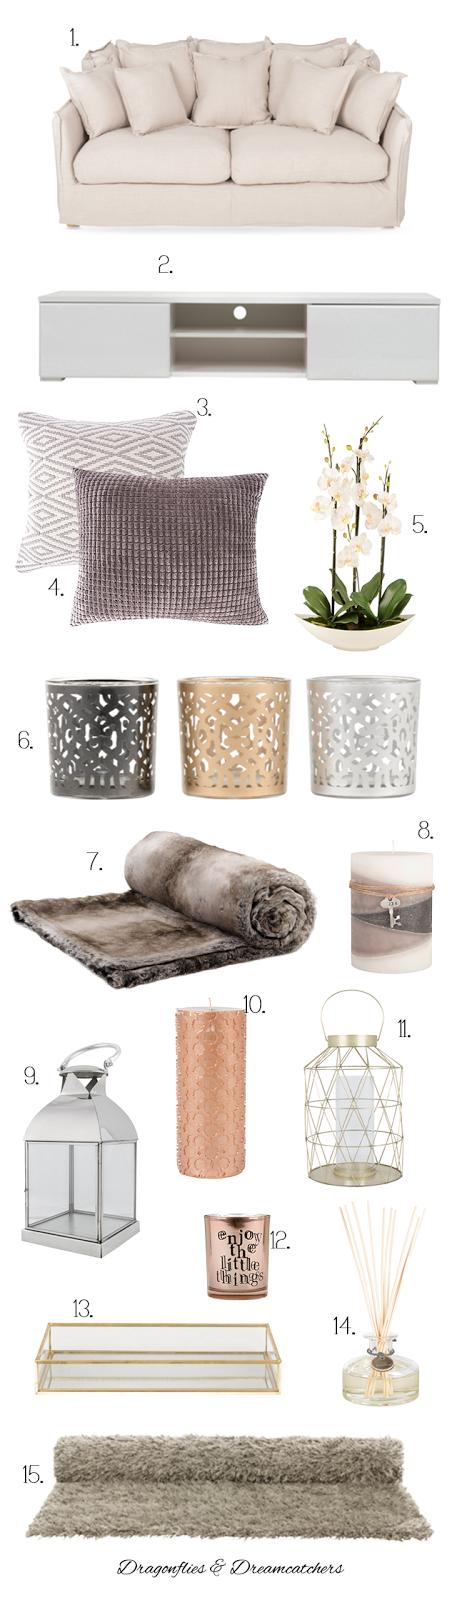 Interior, inspo, items